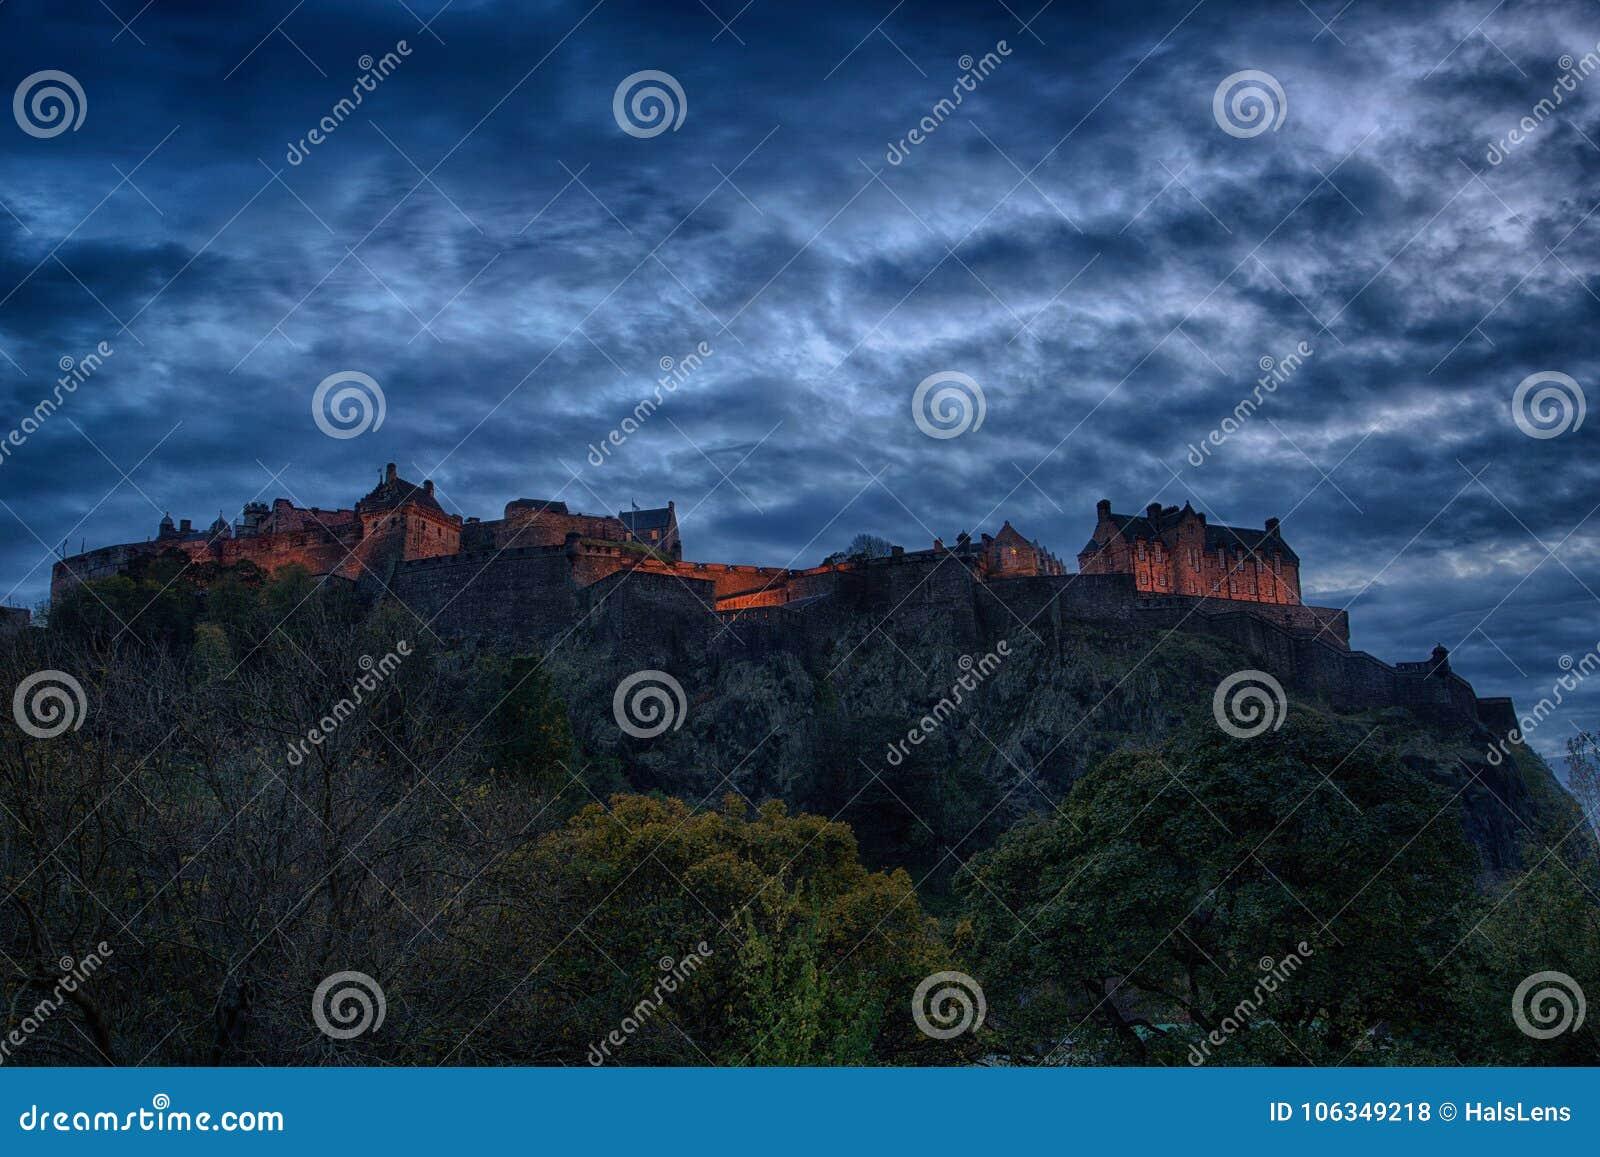 Panoramic view of Edinburgh Castle at Night